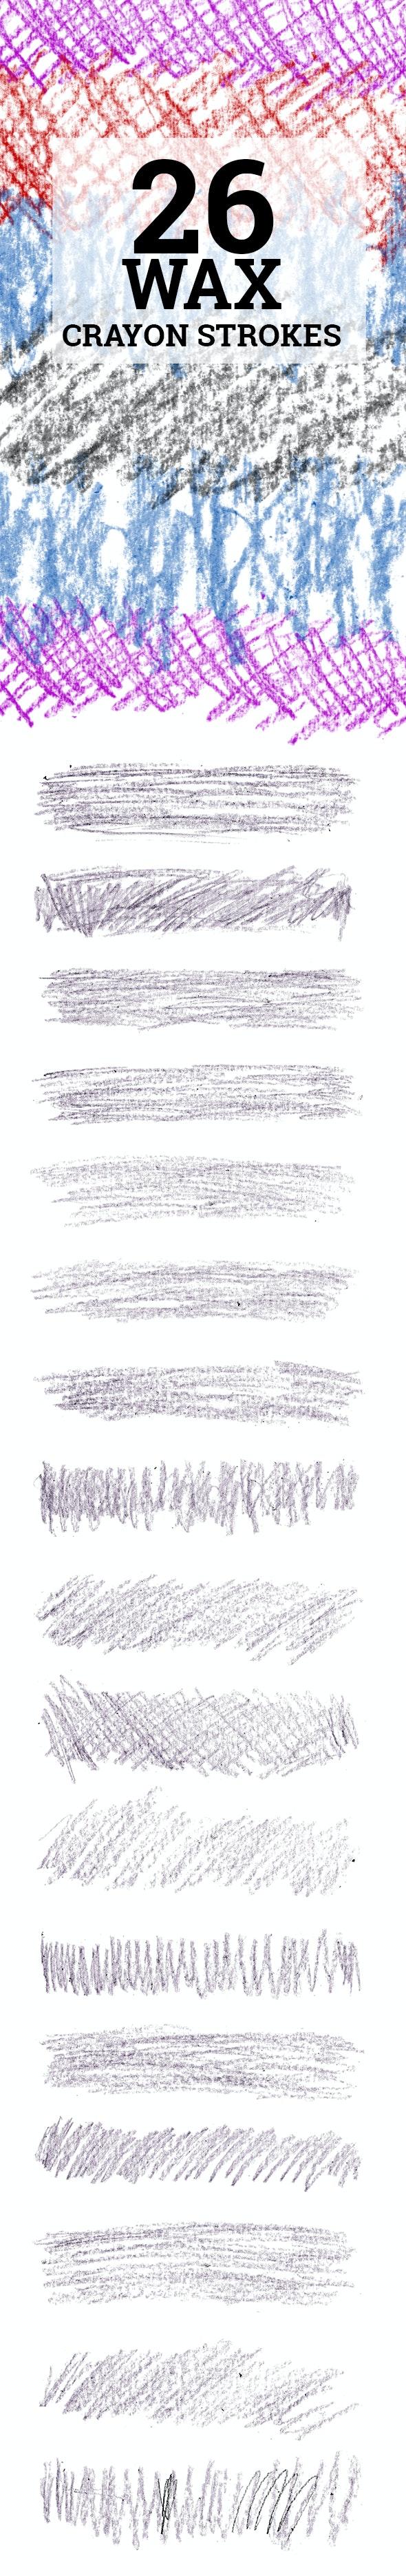 26 Wax Crayon Photoshop Brushes - Artistic Brushes